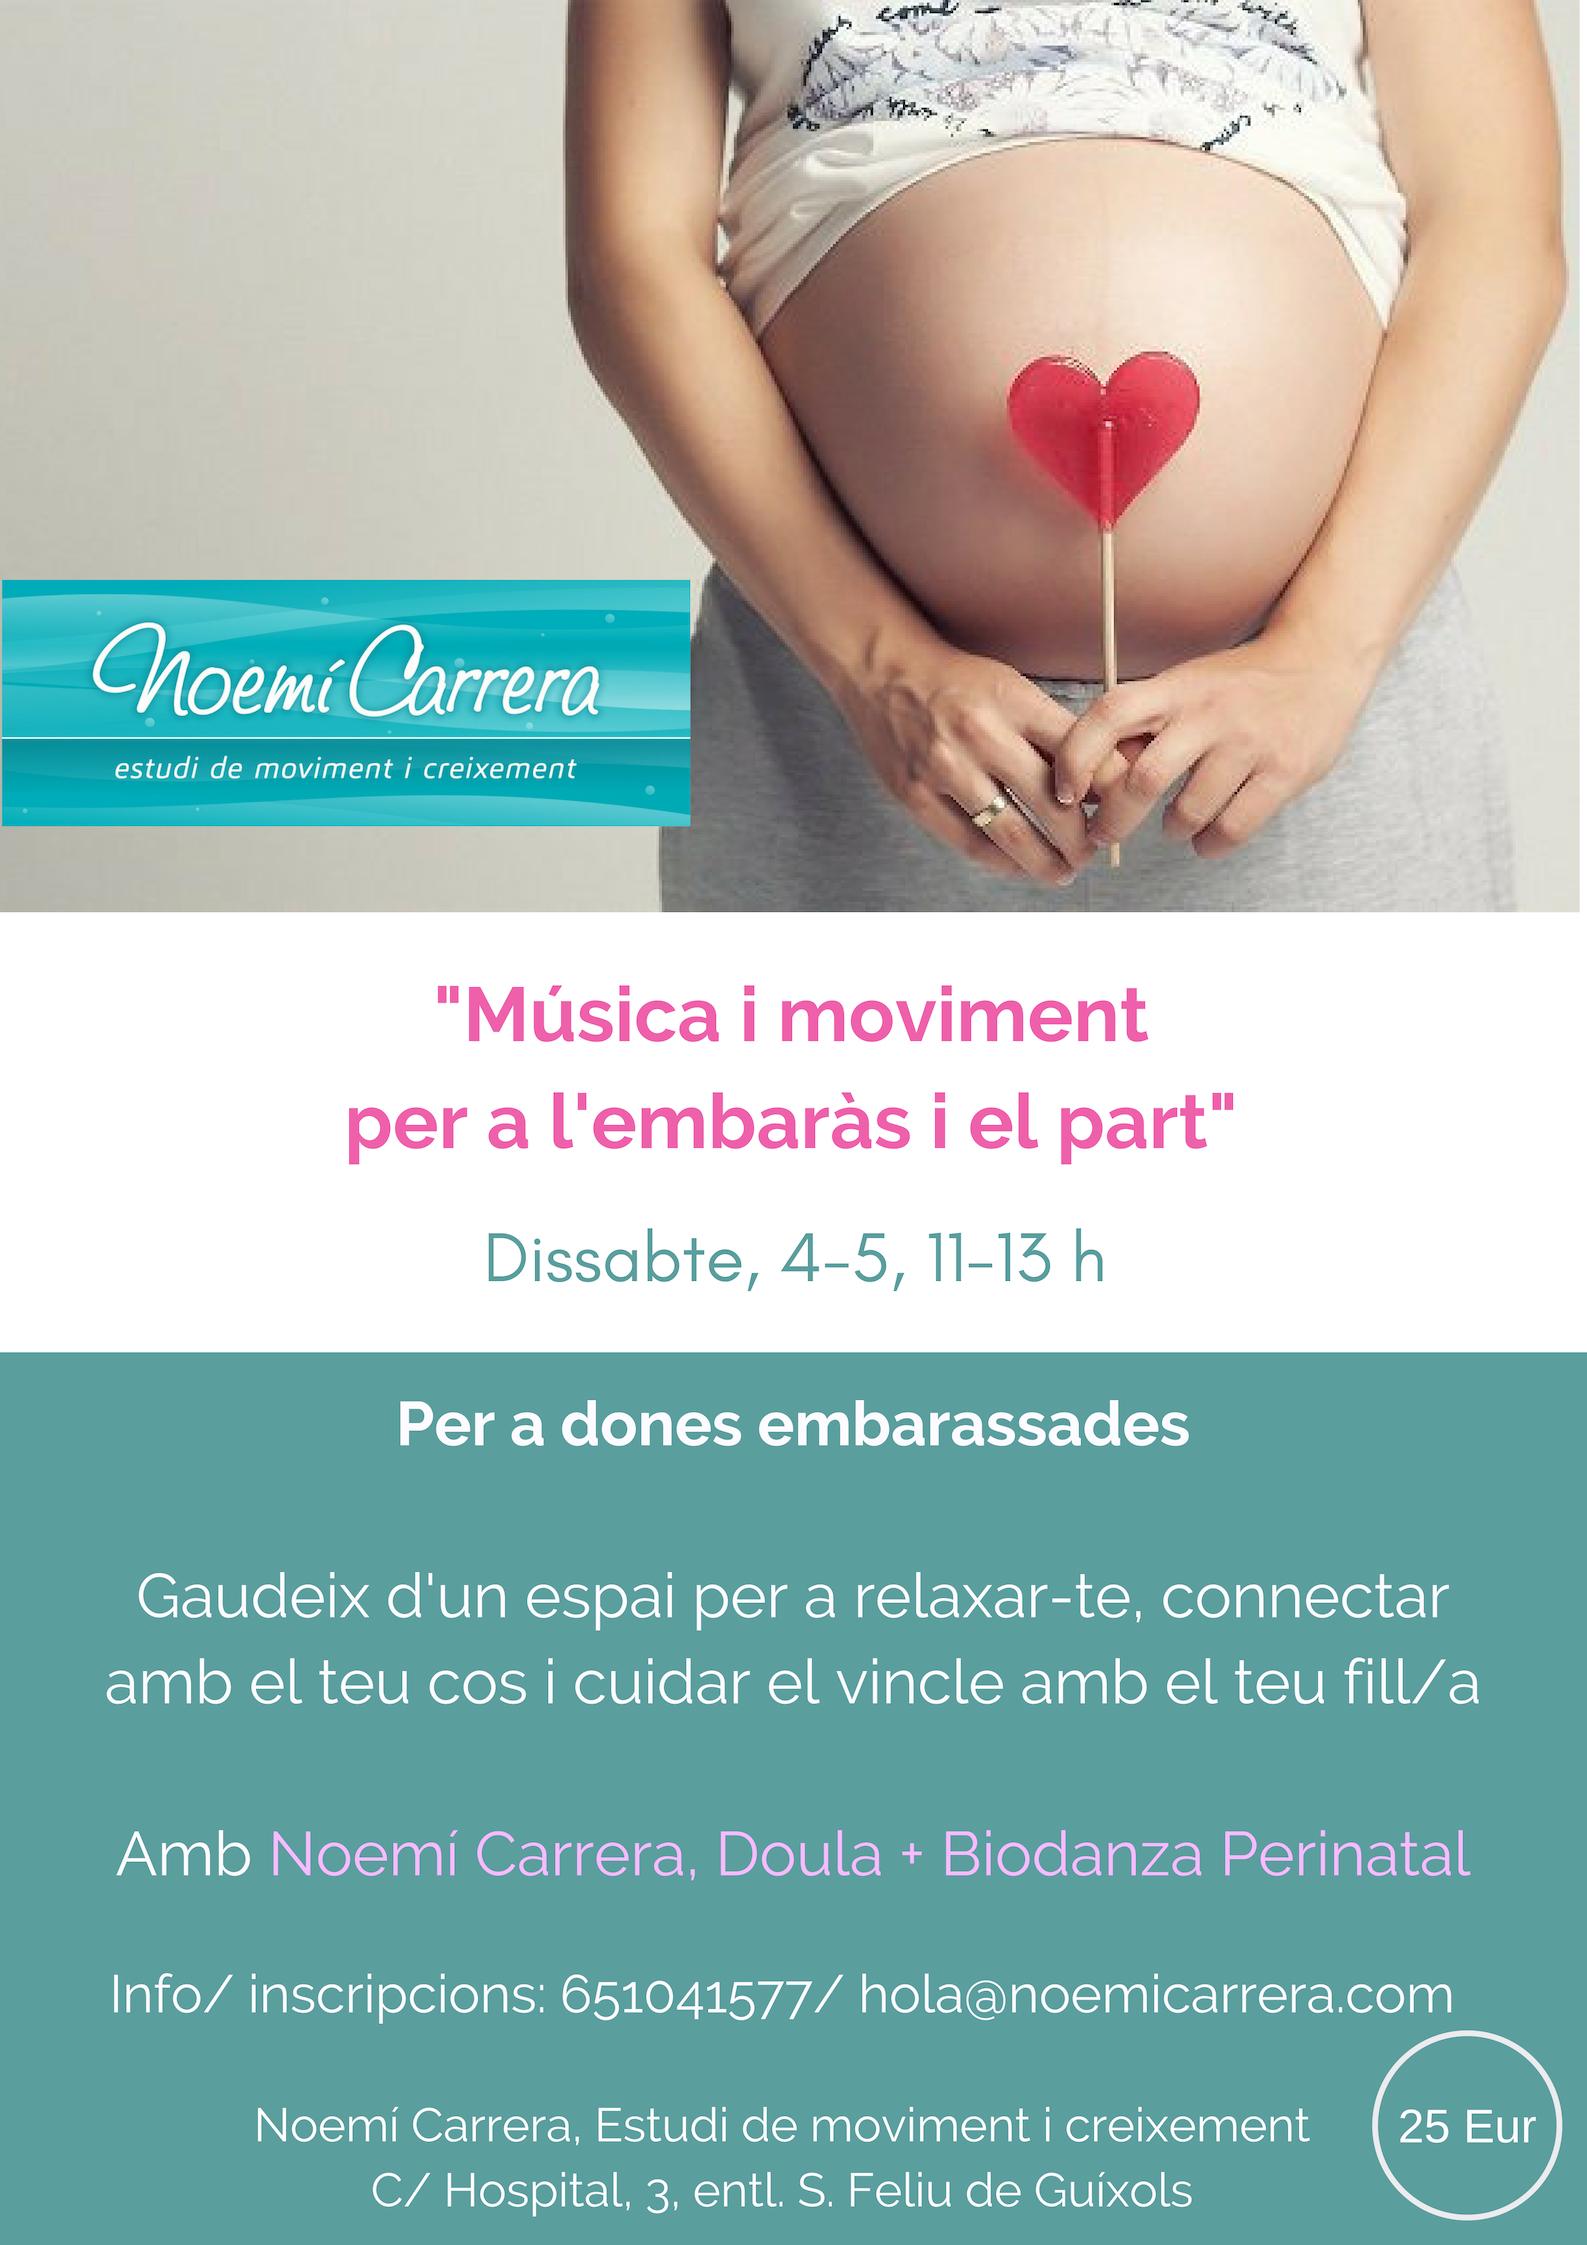 Biodanza embarazadas